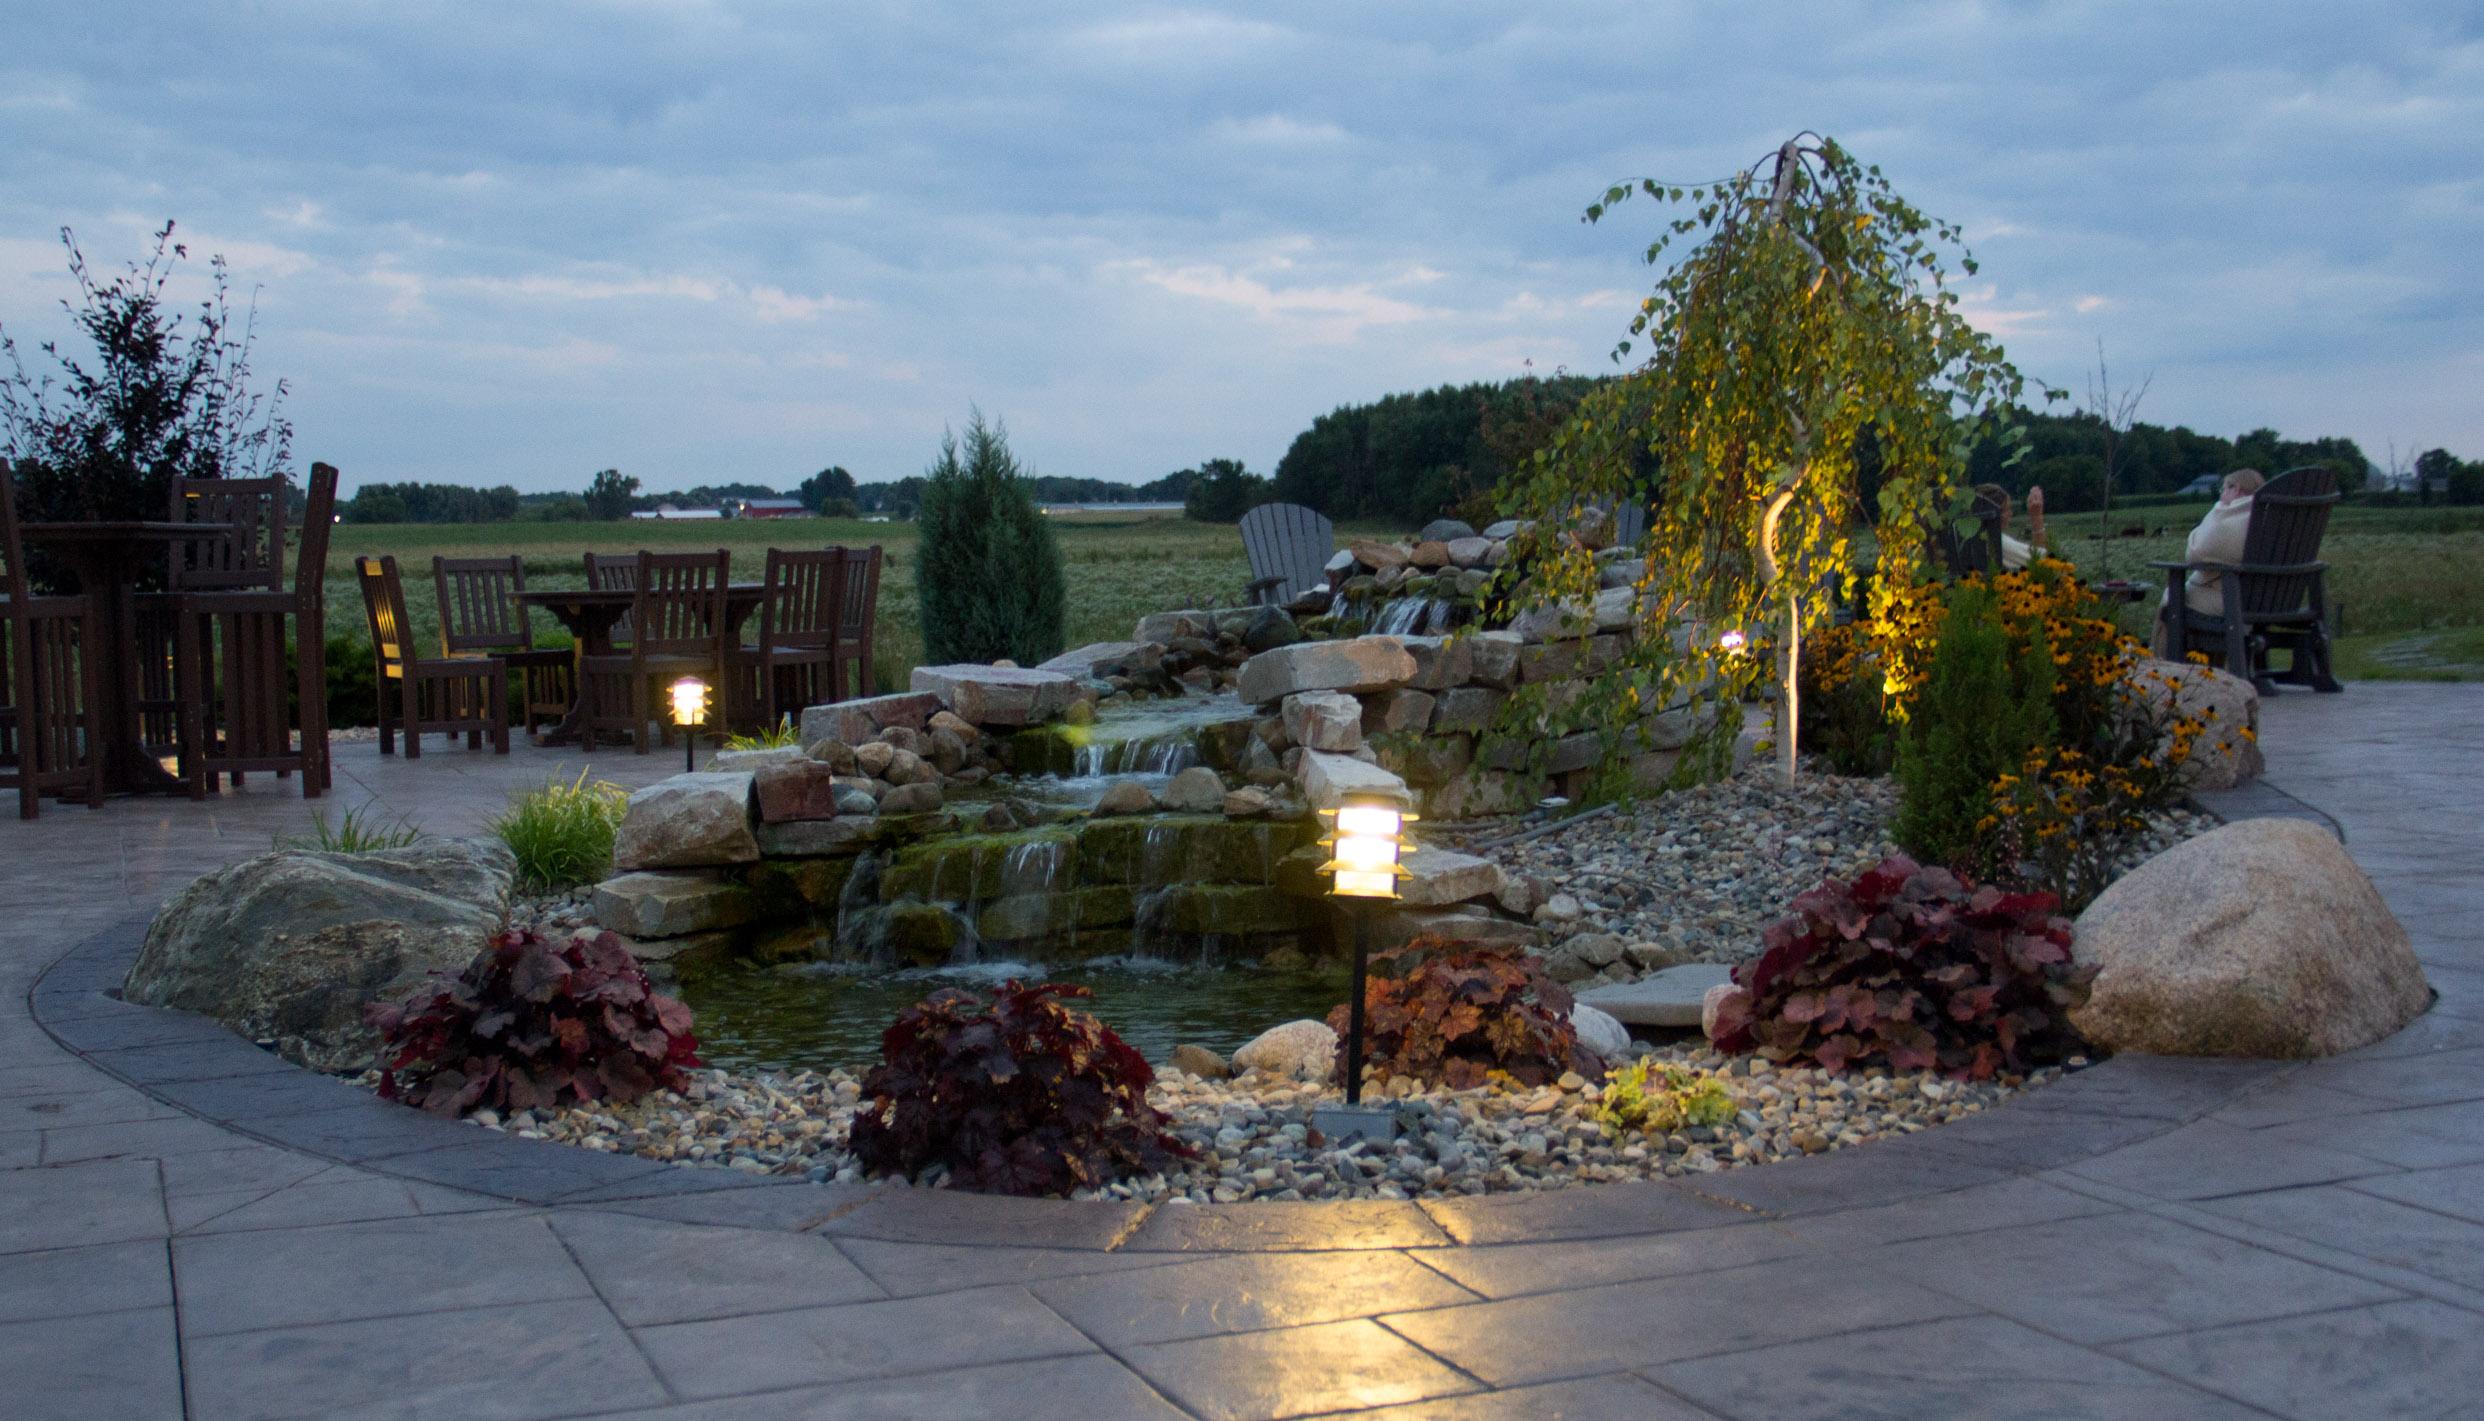 Blue Gate Garden Inn common patio